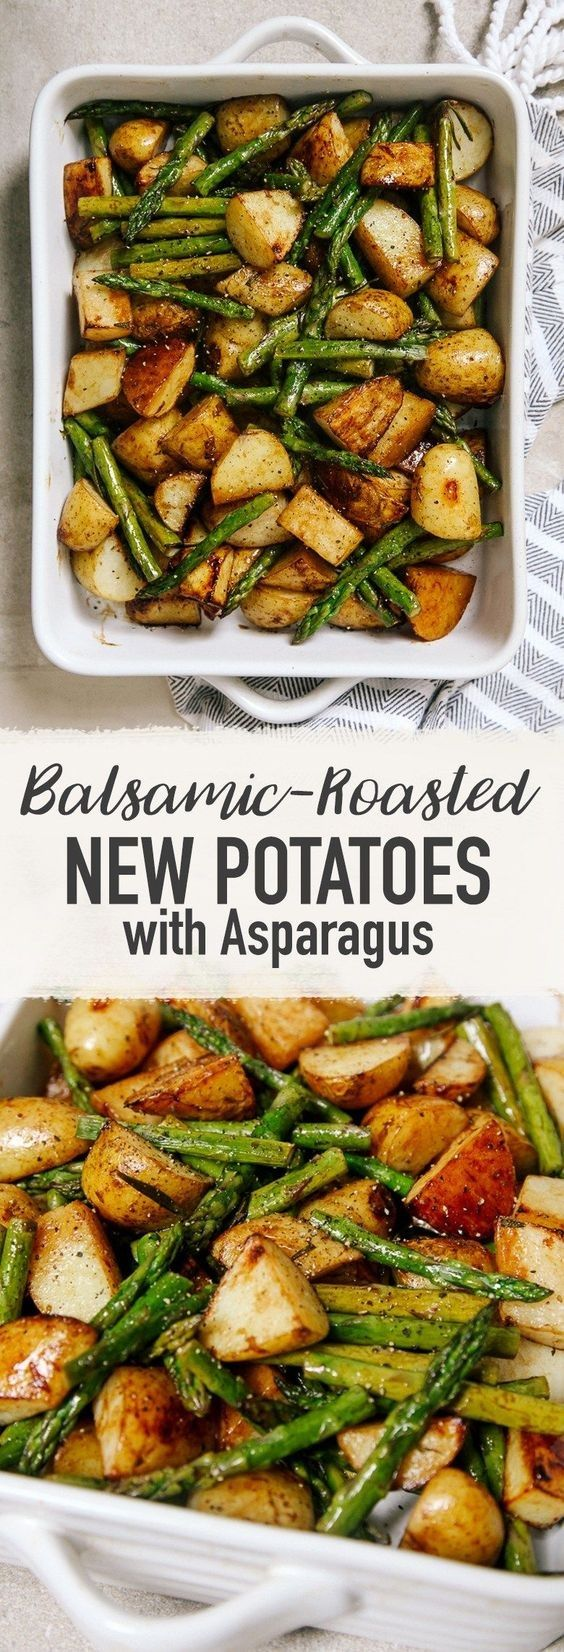 BALSAMIC ROASTED NEW POTATOES WITH ASPARAGUS #healthydinnerrecipesvideos